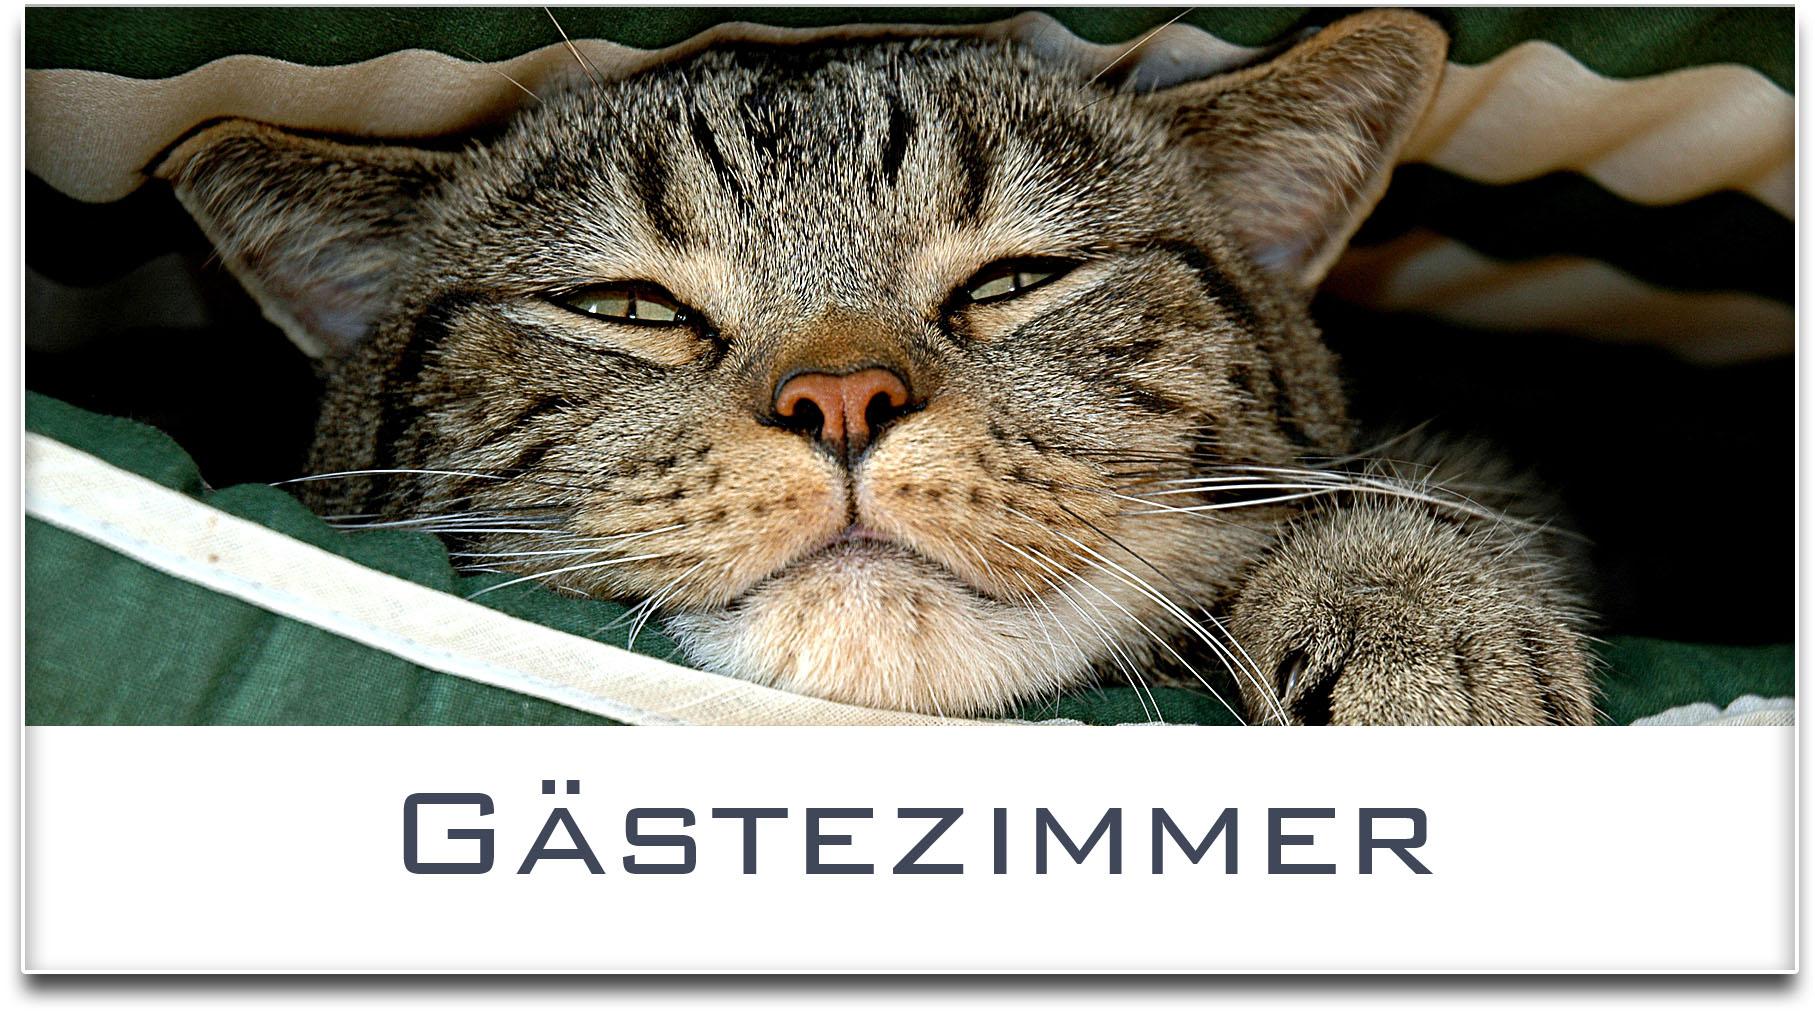 Türschild / Haustürschild / Katze / Gästezimmer / Selbstklebend